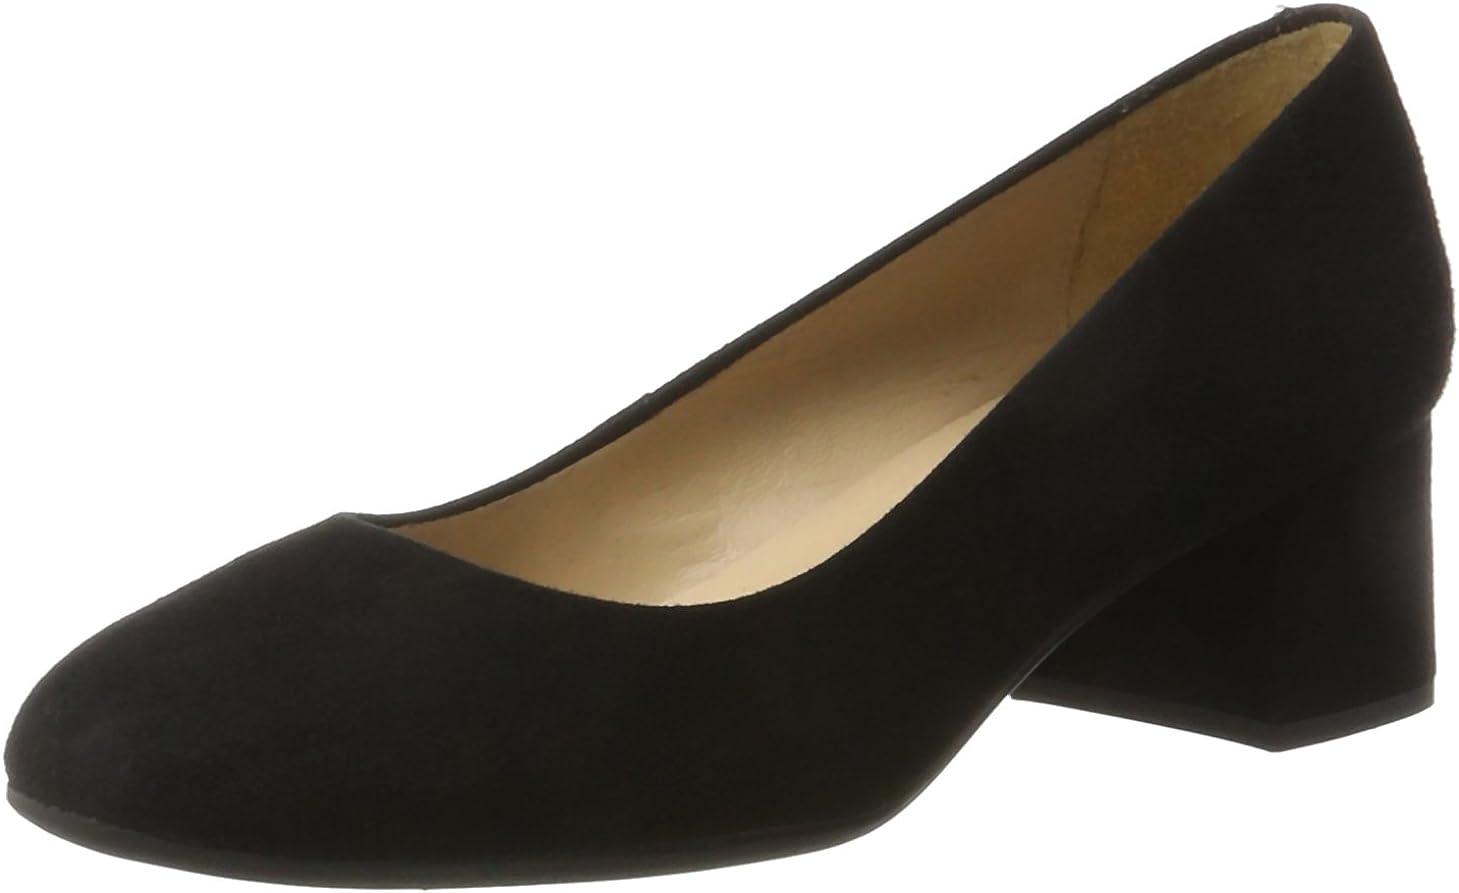 TALLA 38 EU. Unisa Kumer_f17_KS, Zapatos de Tacón para Mujer